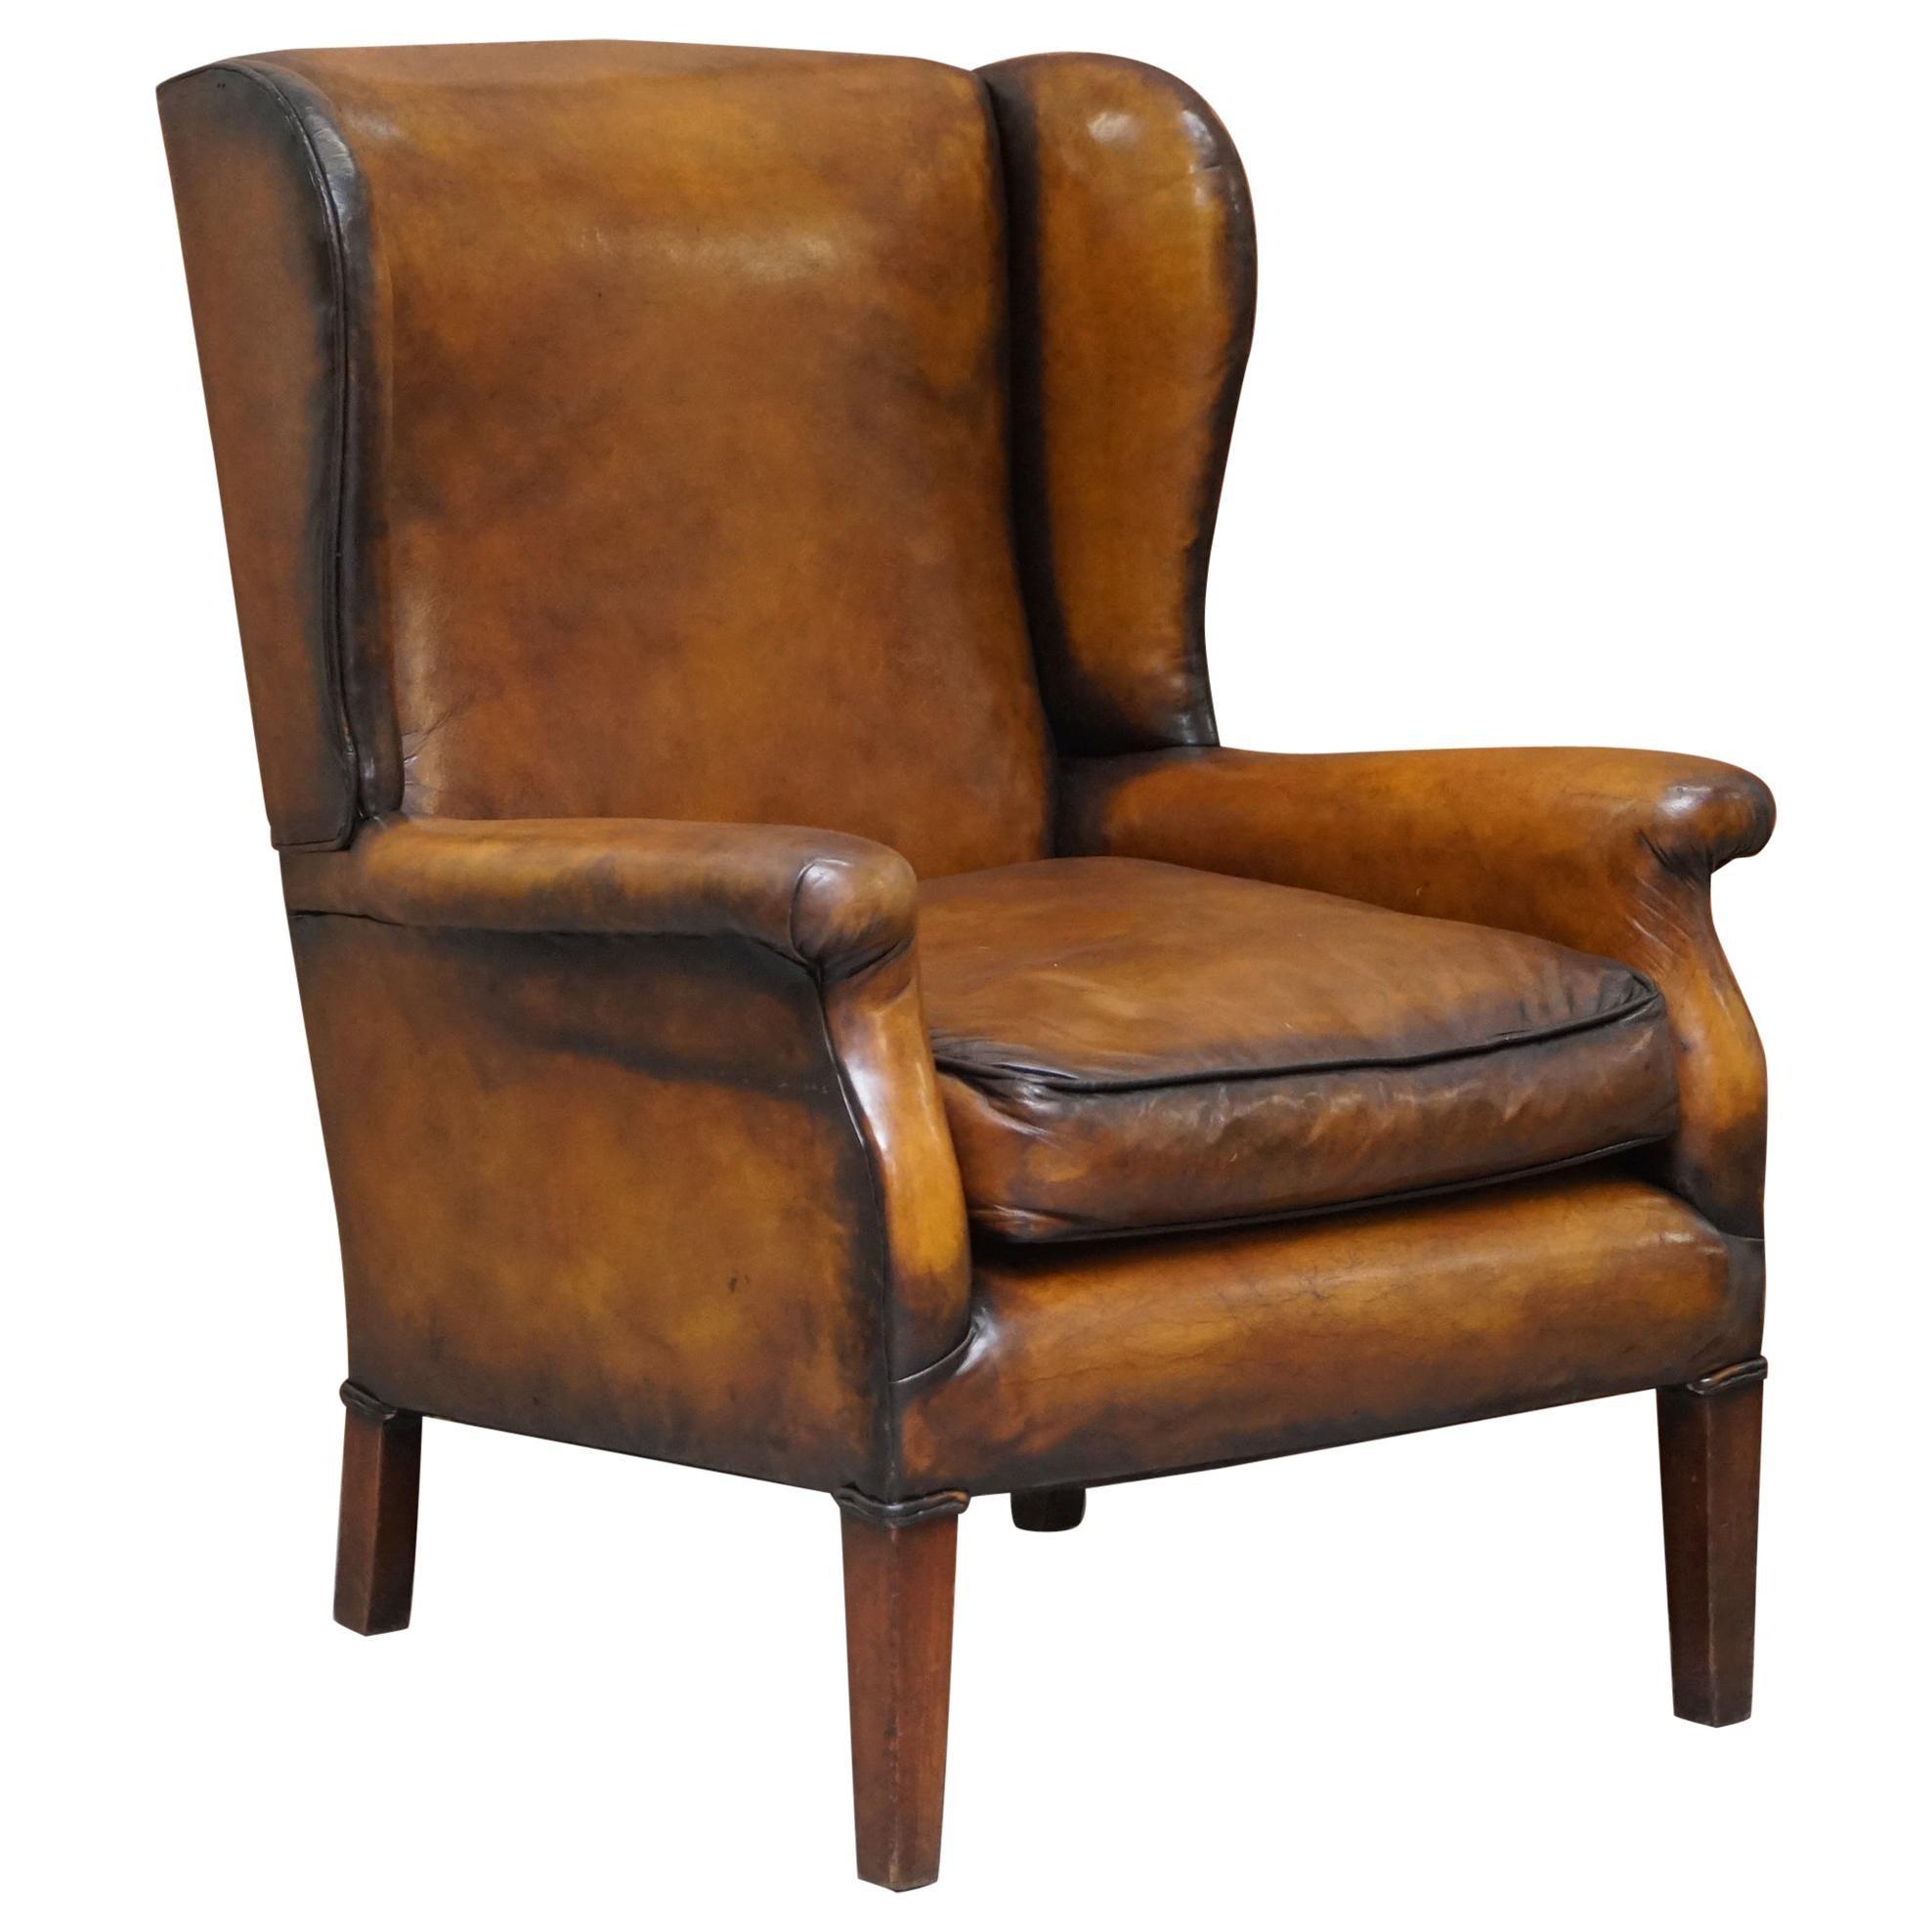 Elegant Fully Restored Edwardian Brown Leather Club Wingback Armchair circa 1900